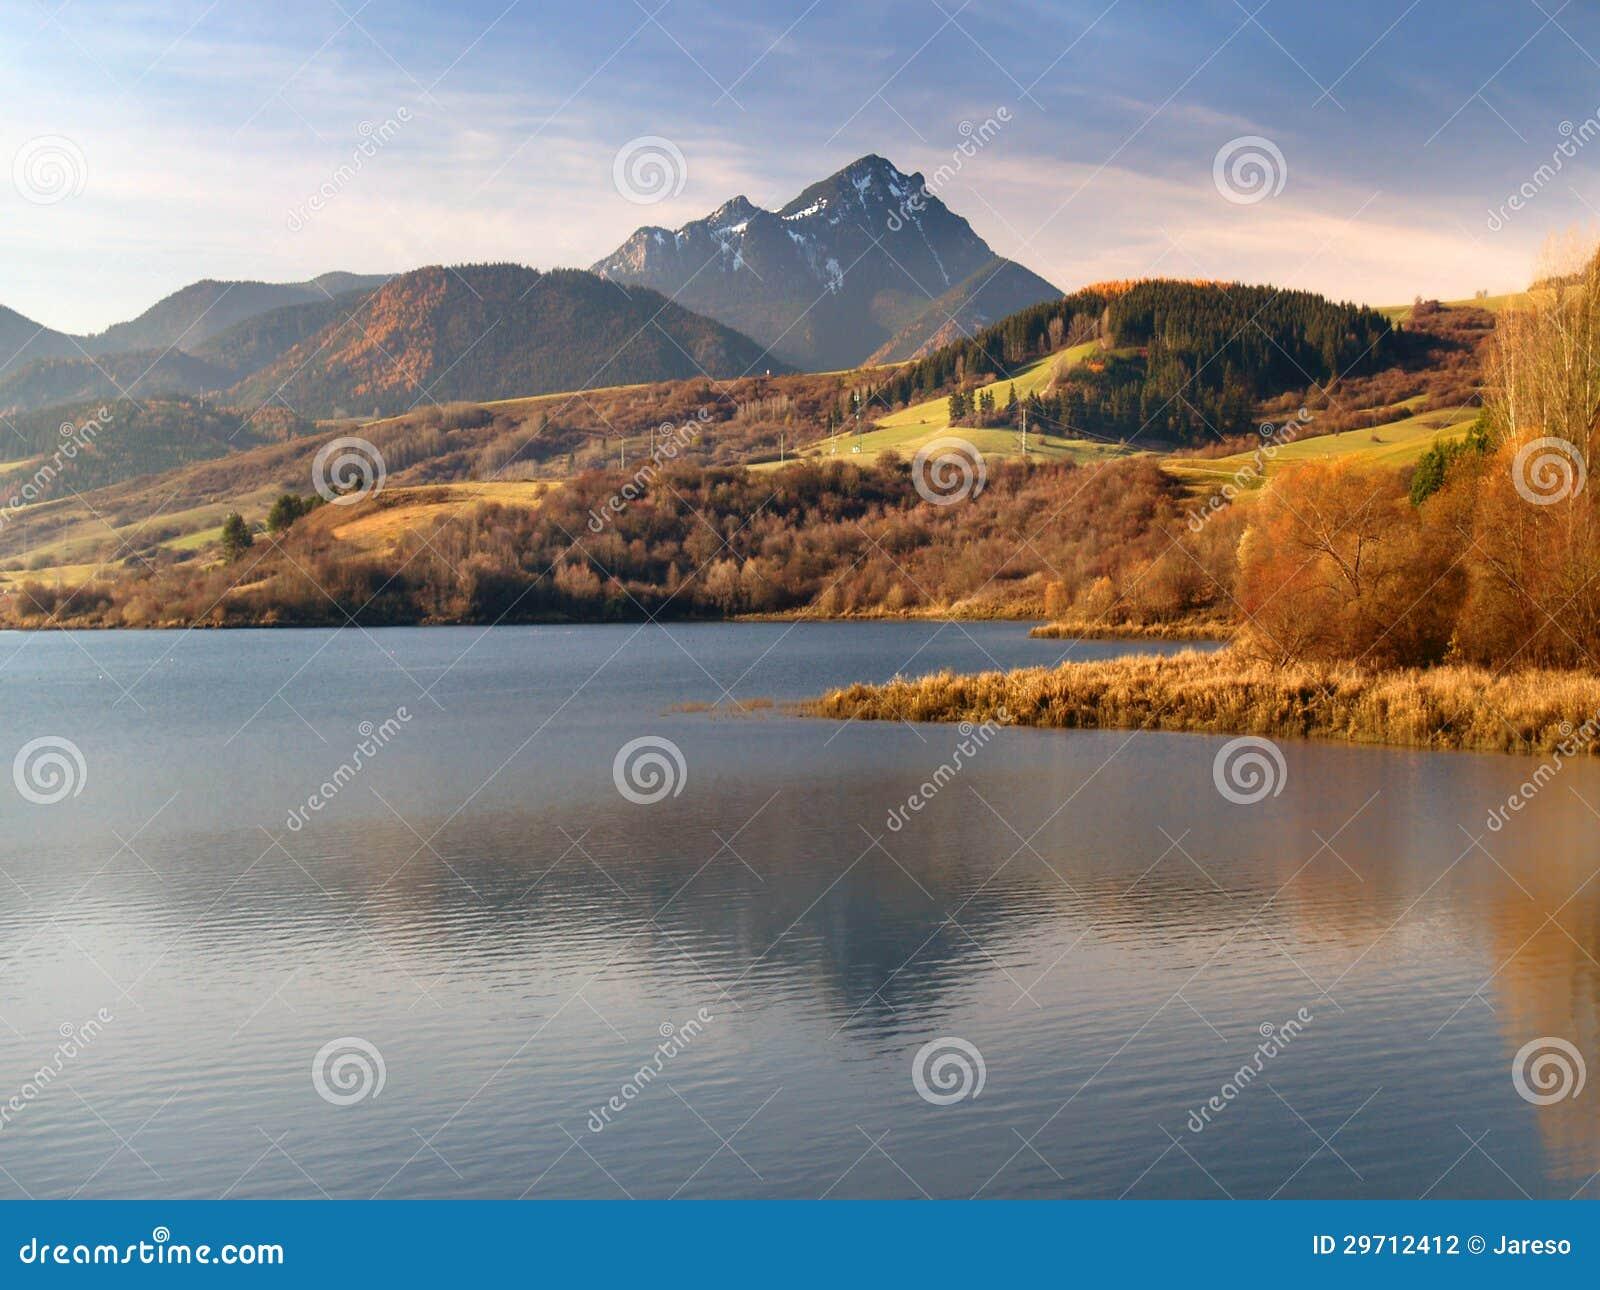 Besenova reservoir and Choc at sundown